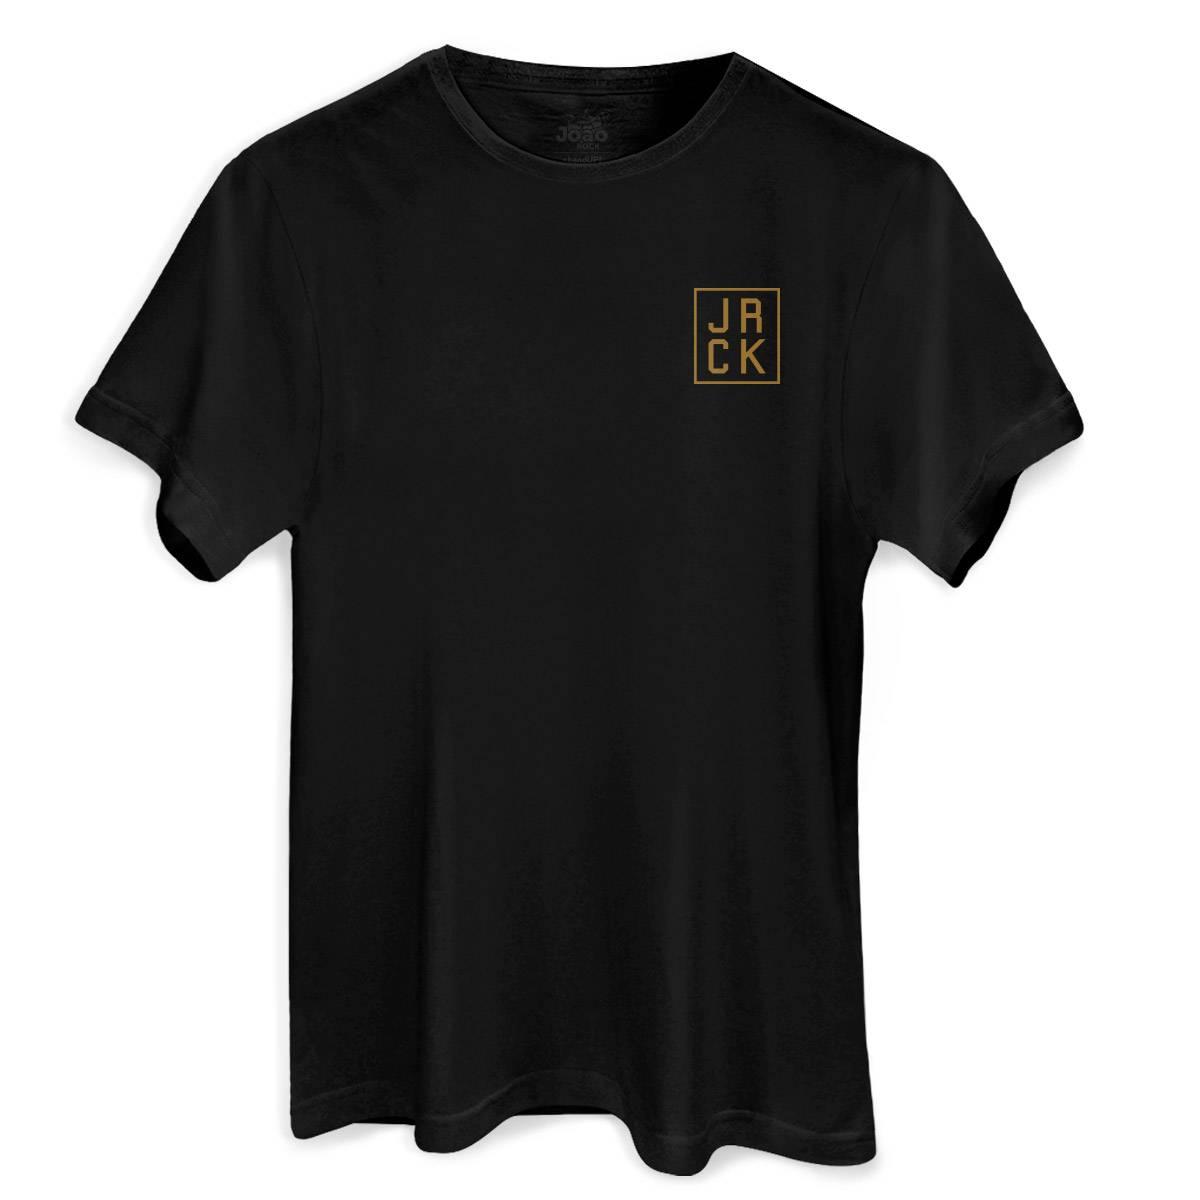 Camiseta Masculina João Rock Fortalecendo o Rock Nacional Desde 02